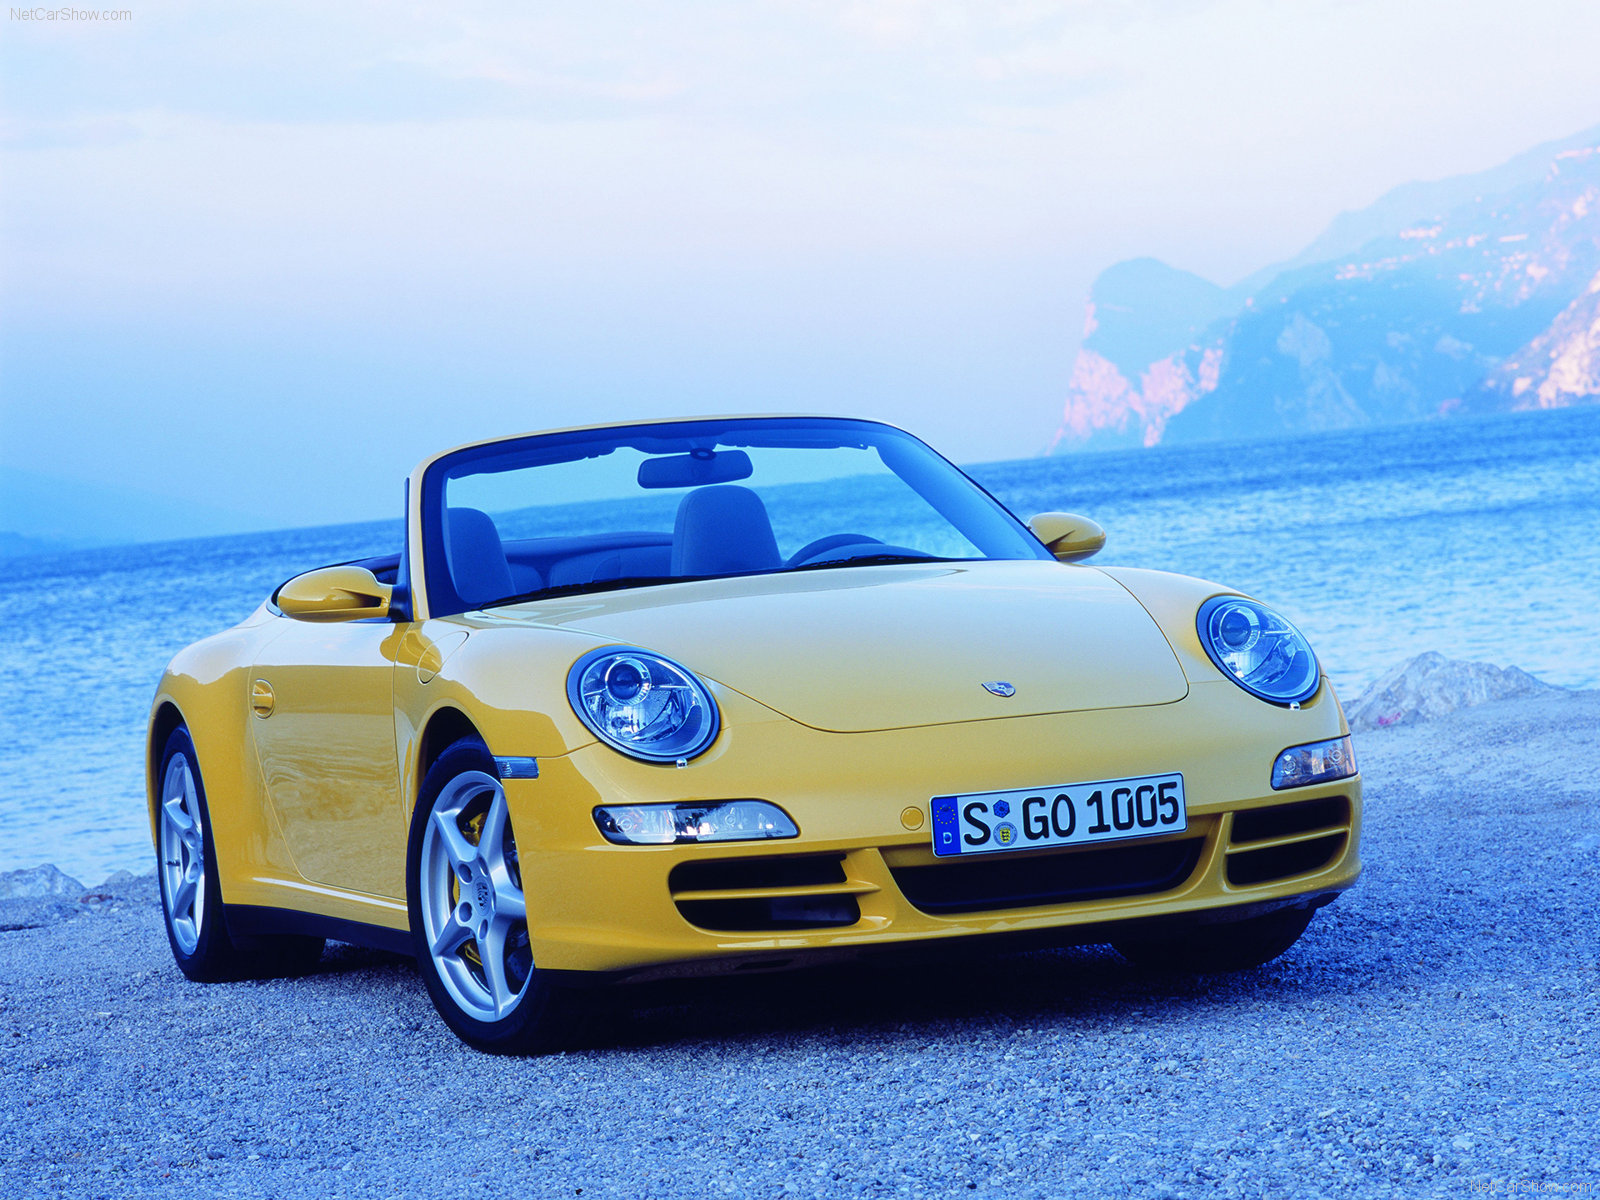 2006 Yellow Porsche 911 Carrera 4 Cabriolet wallpapers